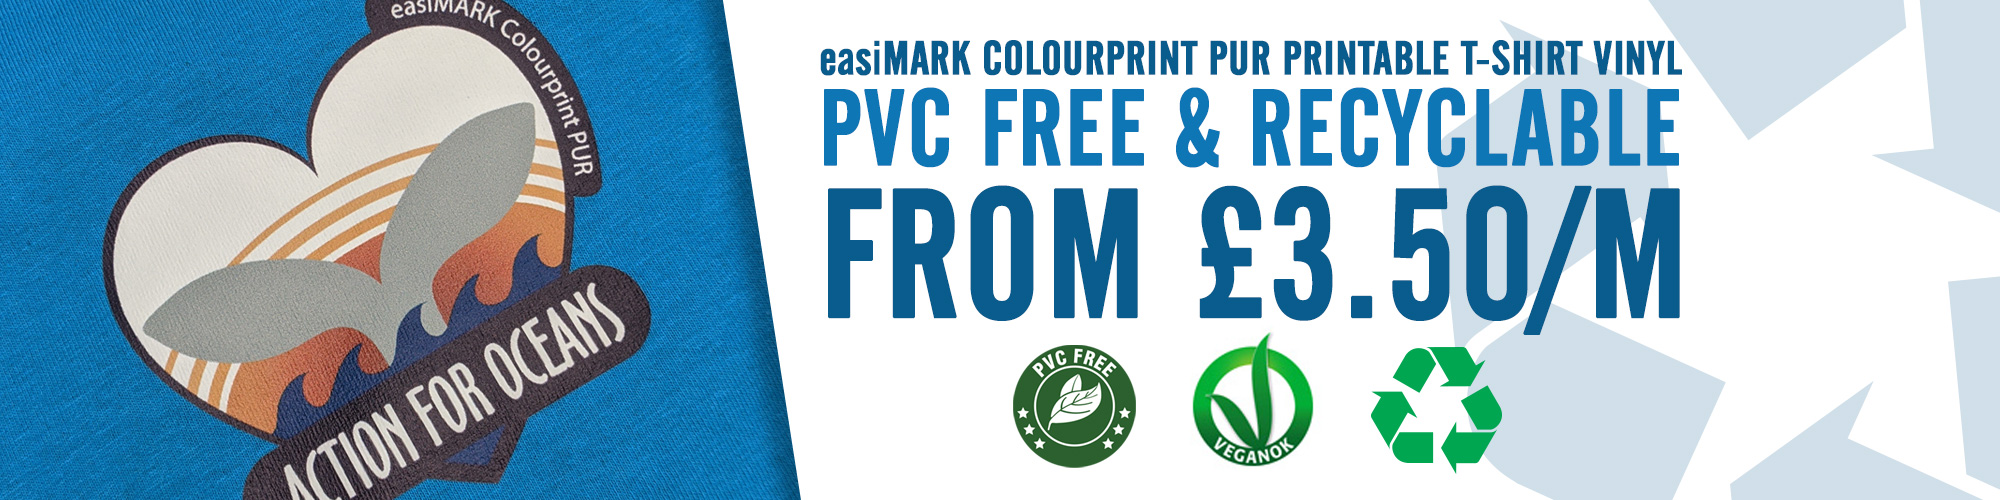 Victory Design - easiMARK Colourprint PUR